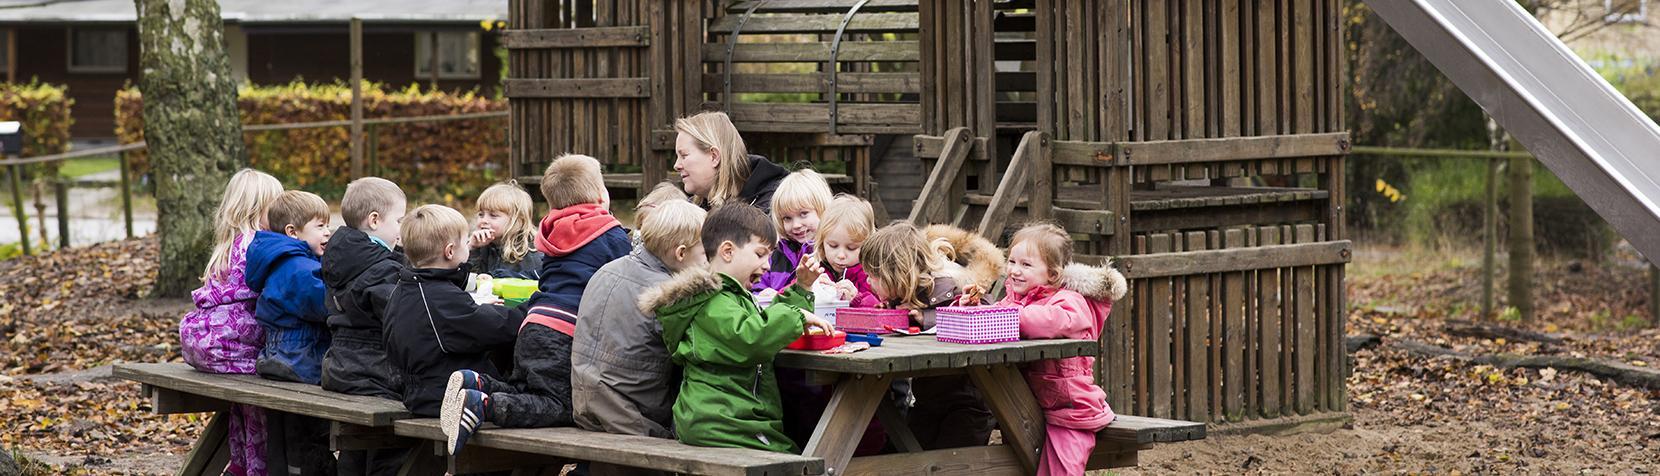 Børn spiser ved bord og bænke